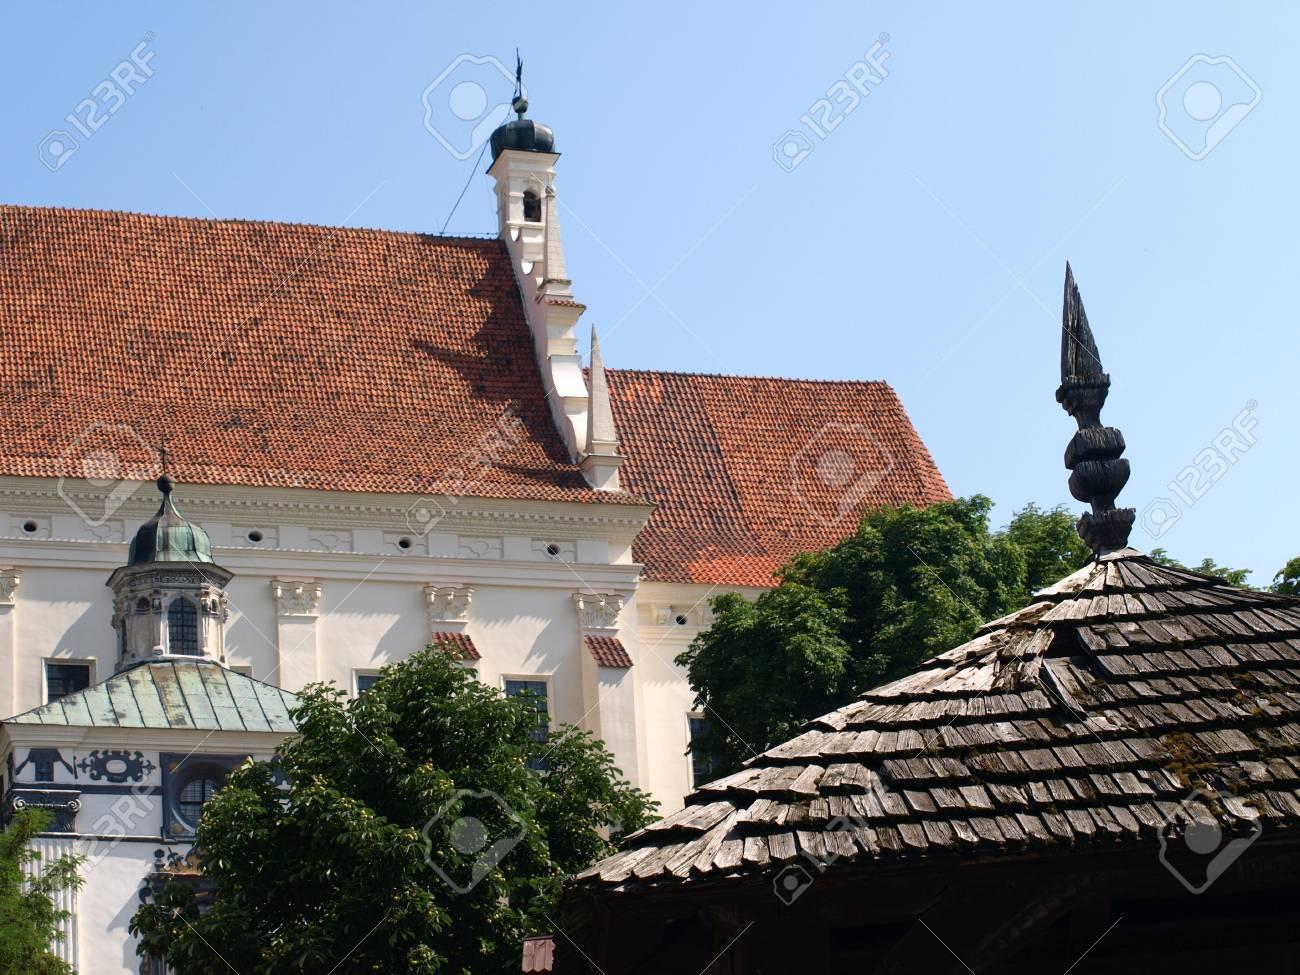 Old church near Old Market place in Kazimierz Dolny, Poland Stock Photo - 13775726